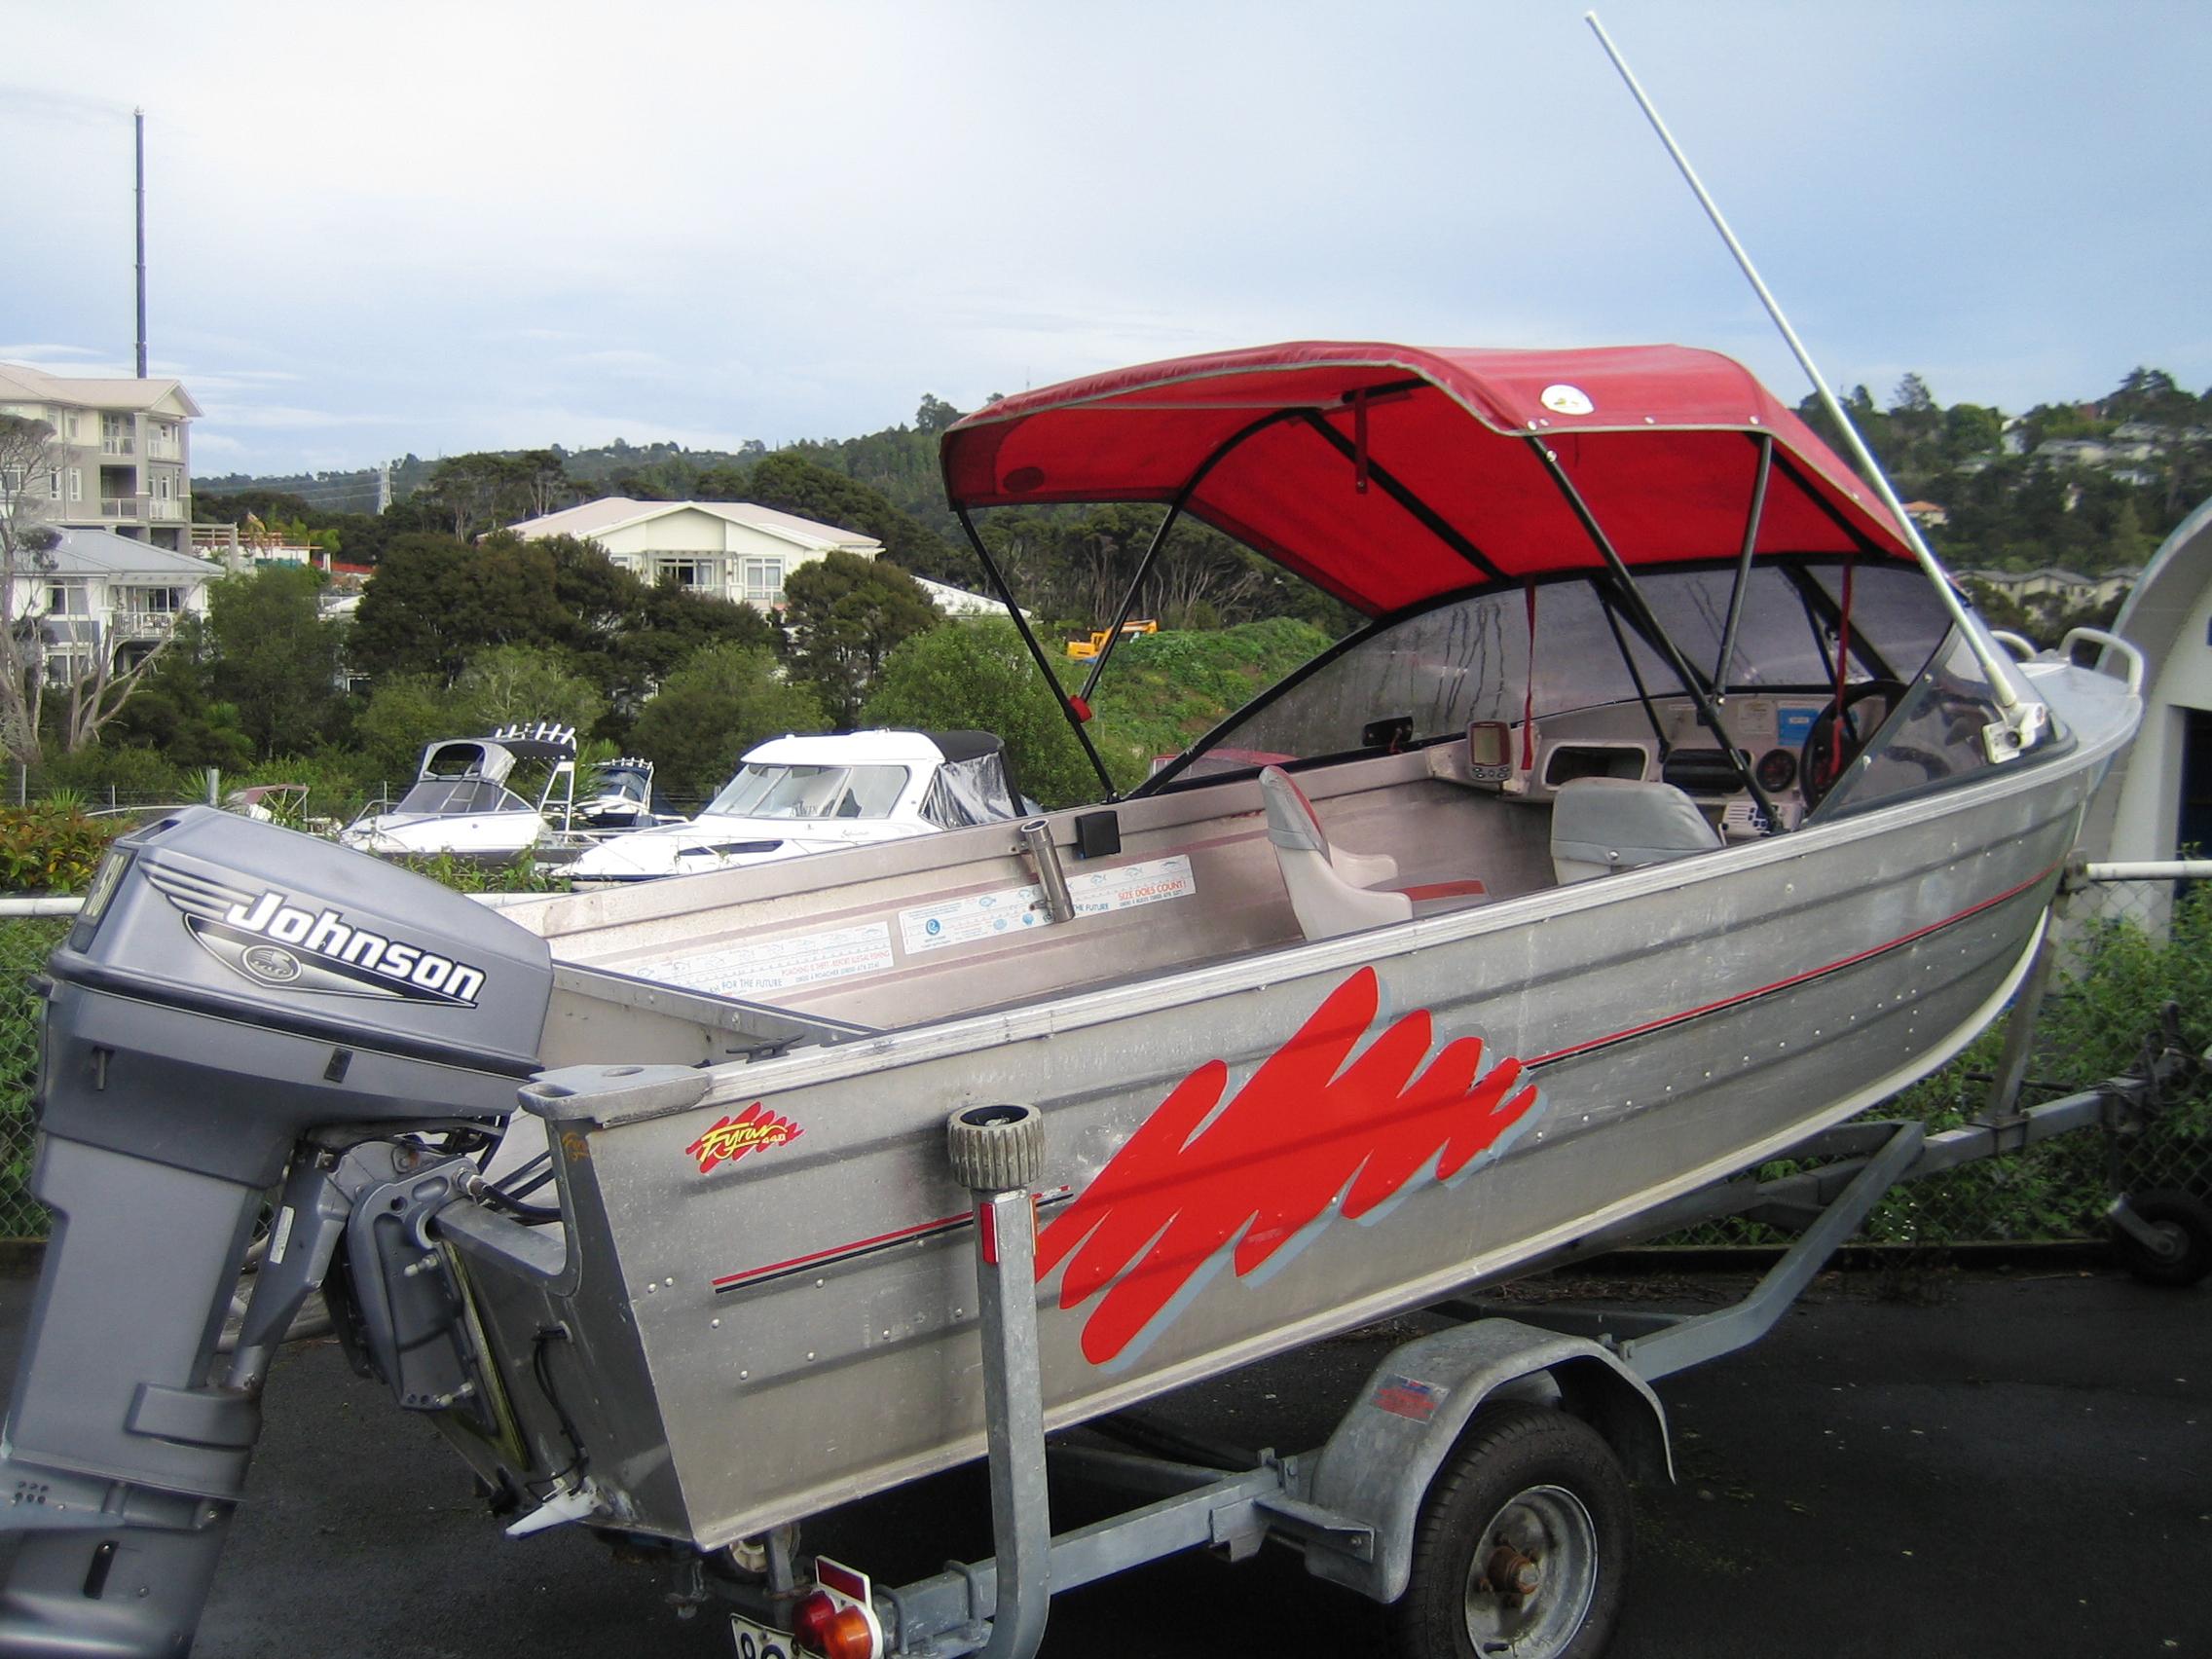 Boat for sale fyran 440 1999 for Outboard motors for sale nz